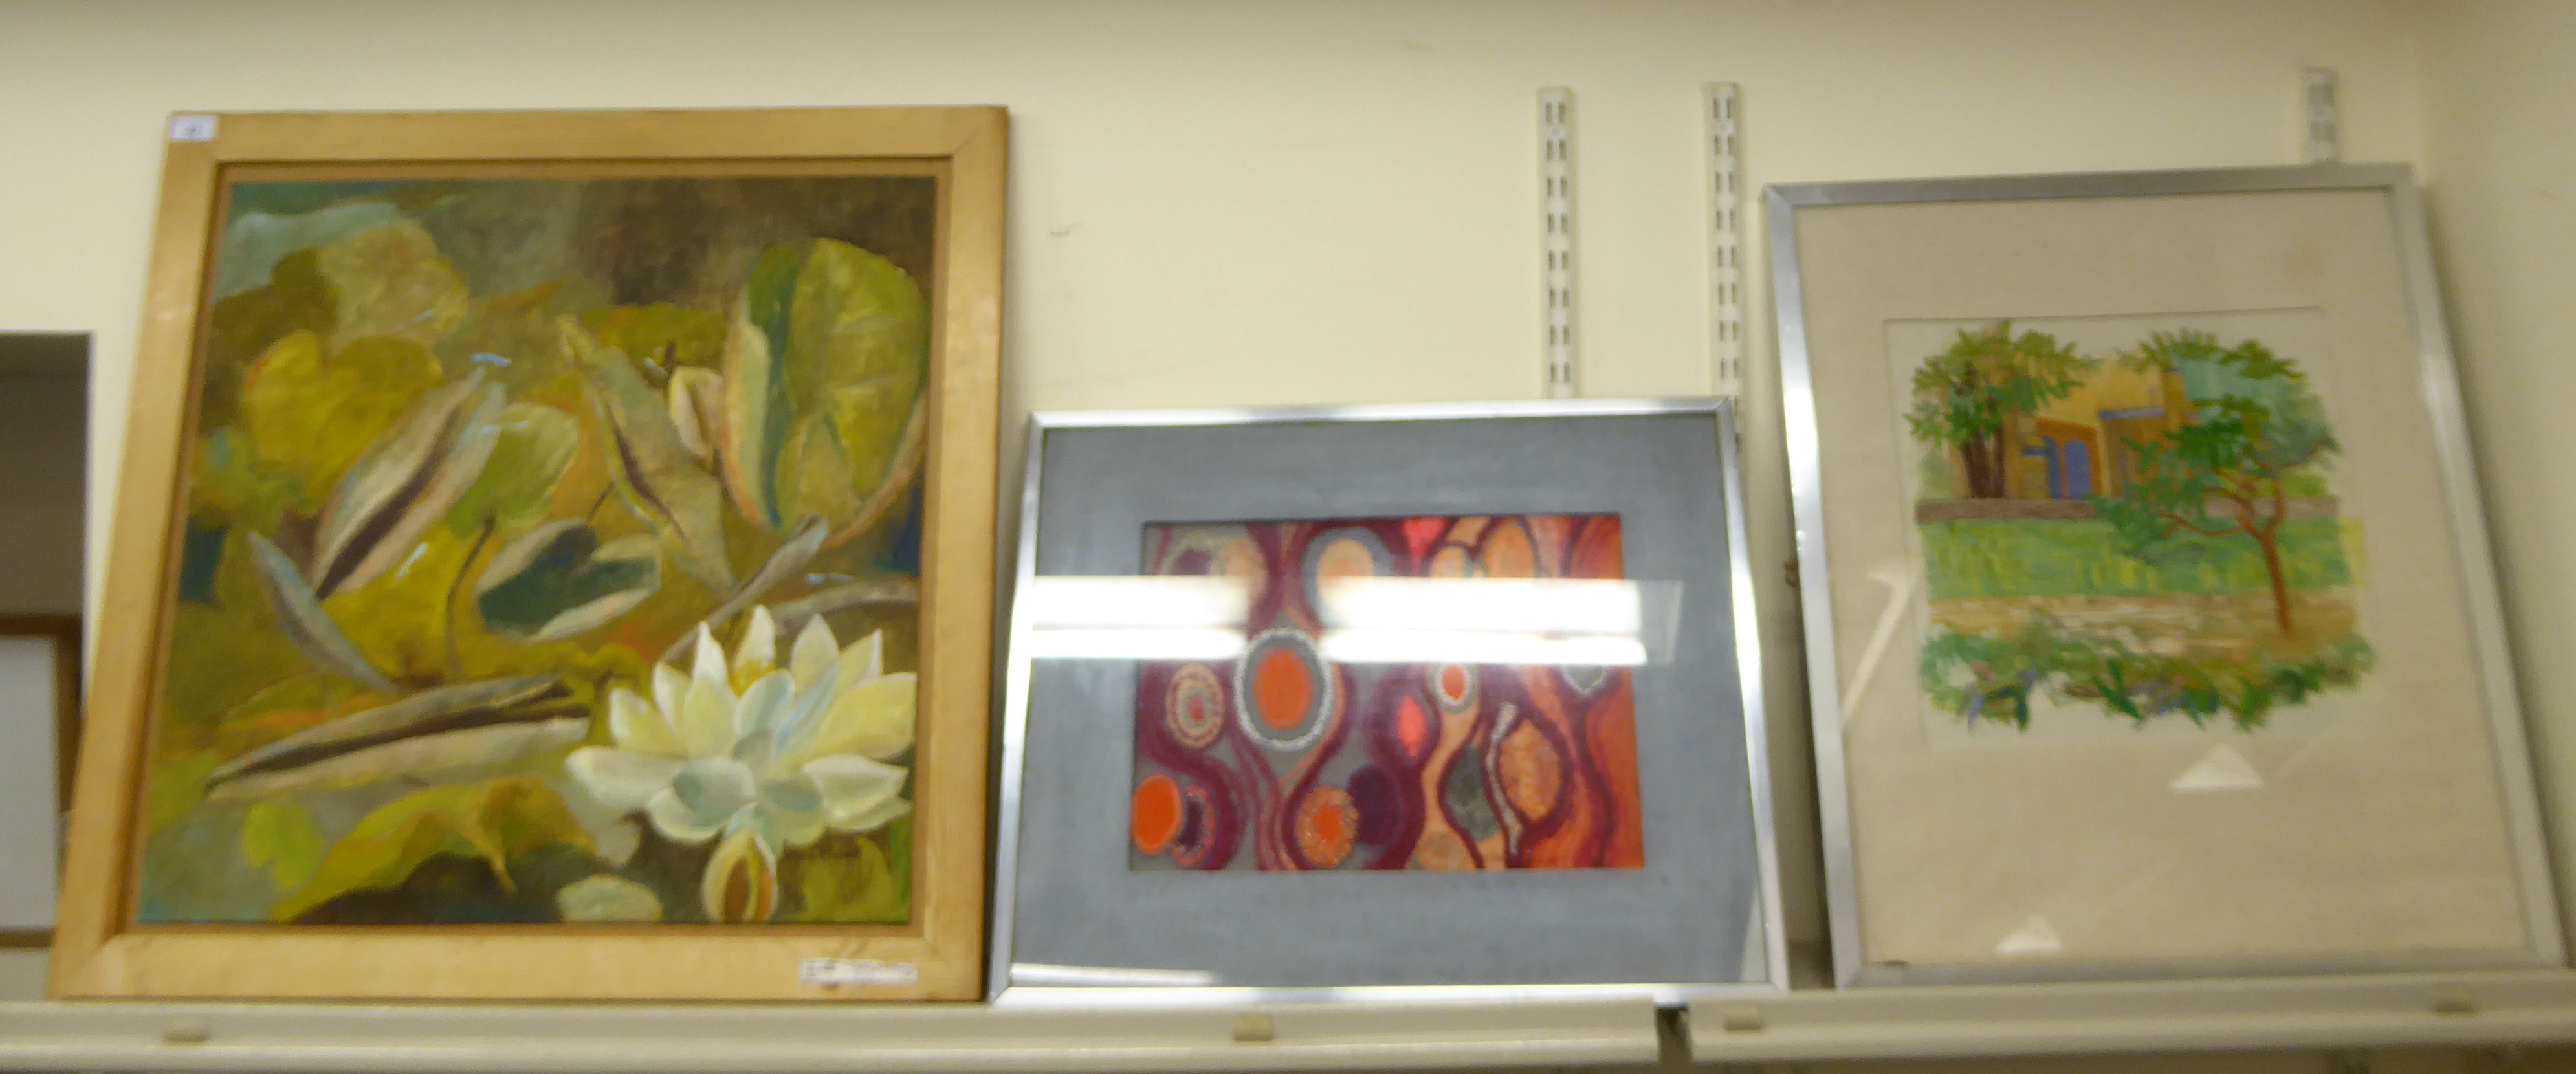 Lot 42 - Three works by Dora Hurst - 'Sumac Tree' 16'' x 24''; 'Growth Rhythm' 19'' x 15'';